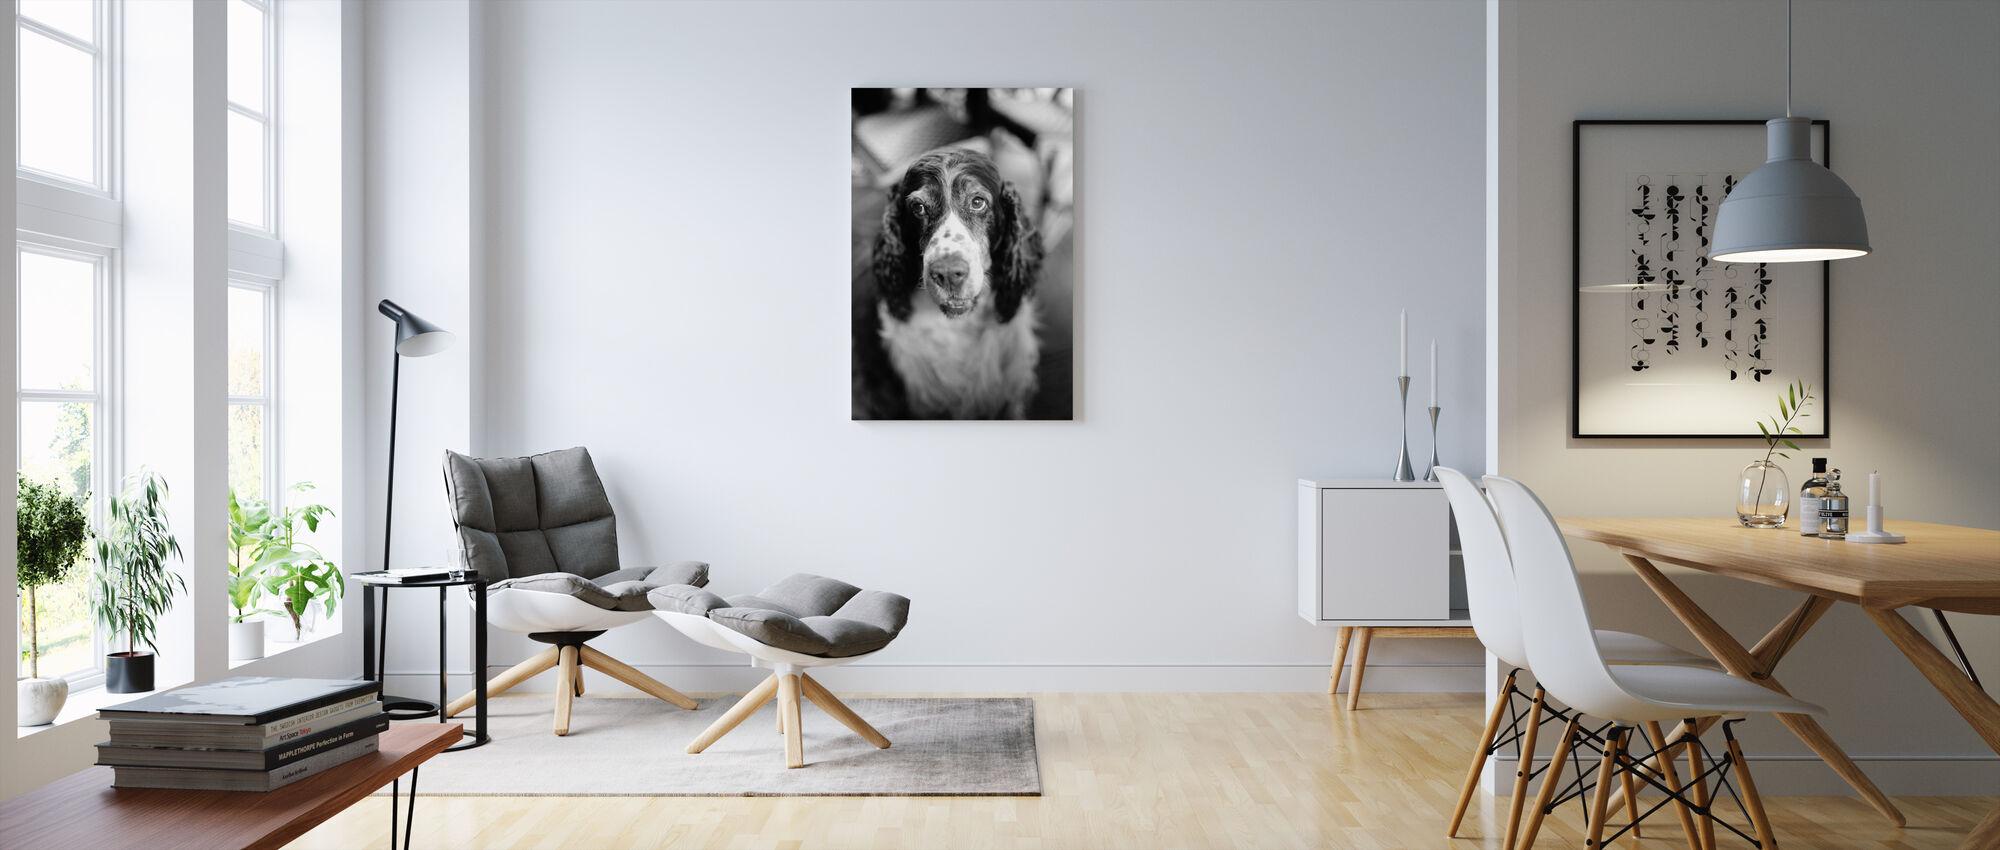 Loyal Friend - Canvas print - Living Room